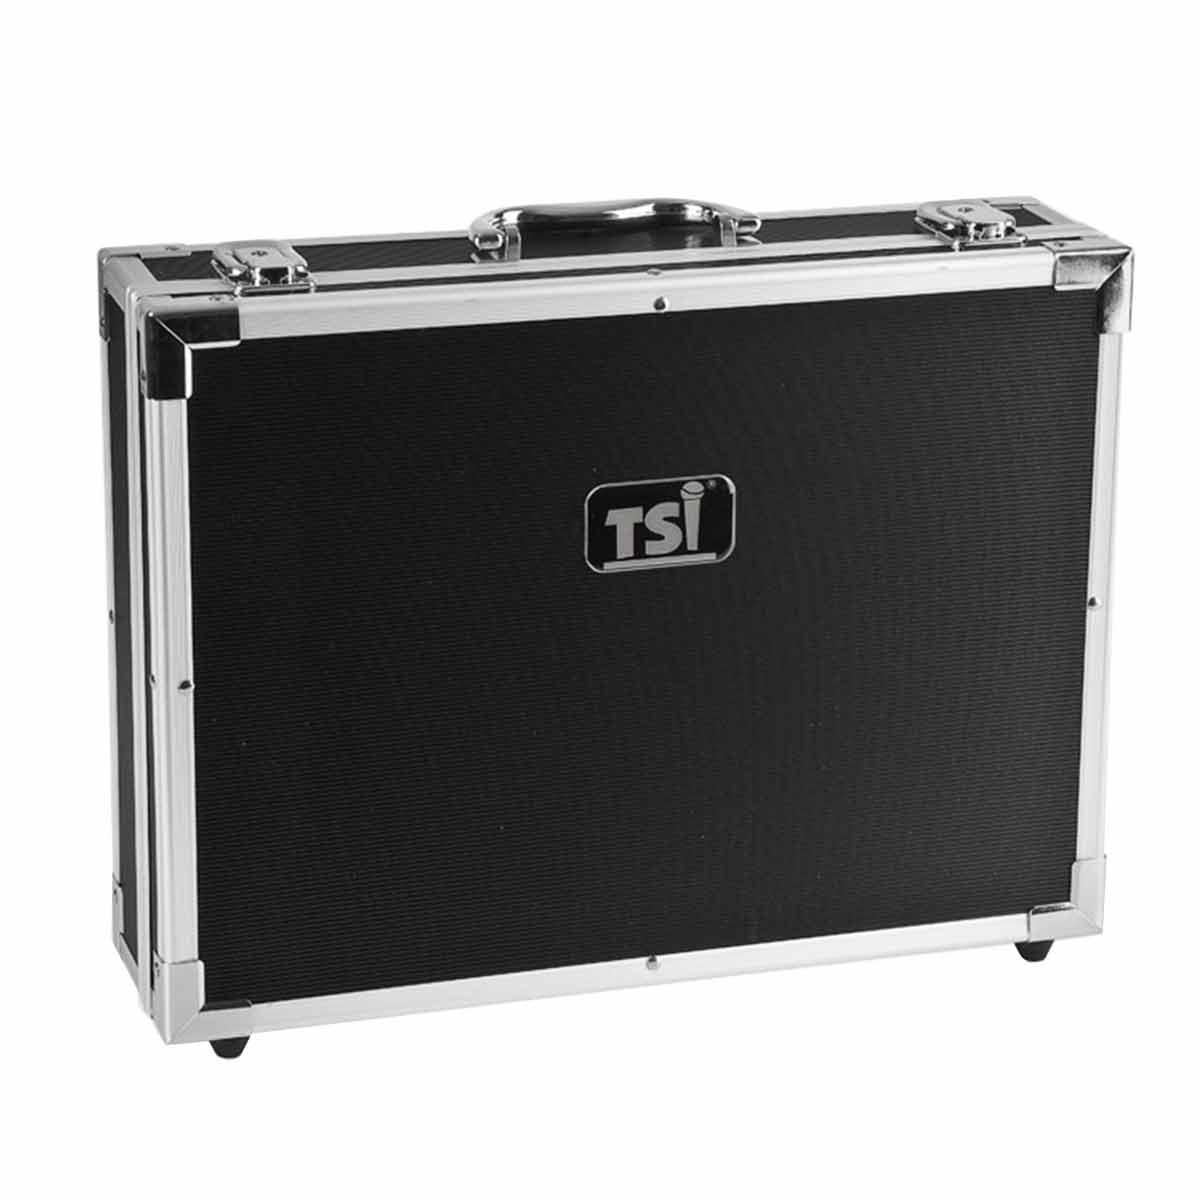 KITDSM7 - Kit 7 Microfones c/ Fio p/ Bateria KIT DSM 7 - TSI